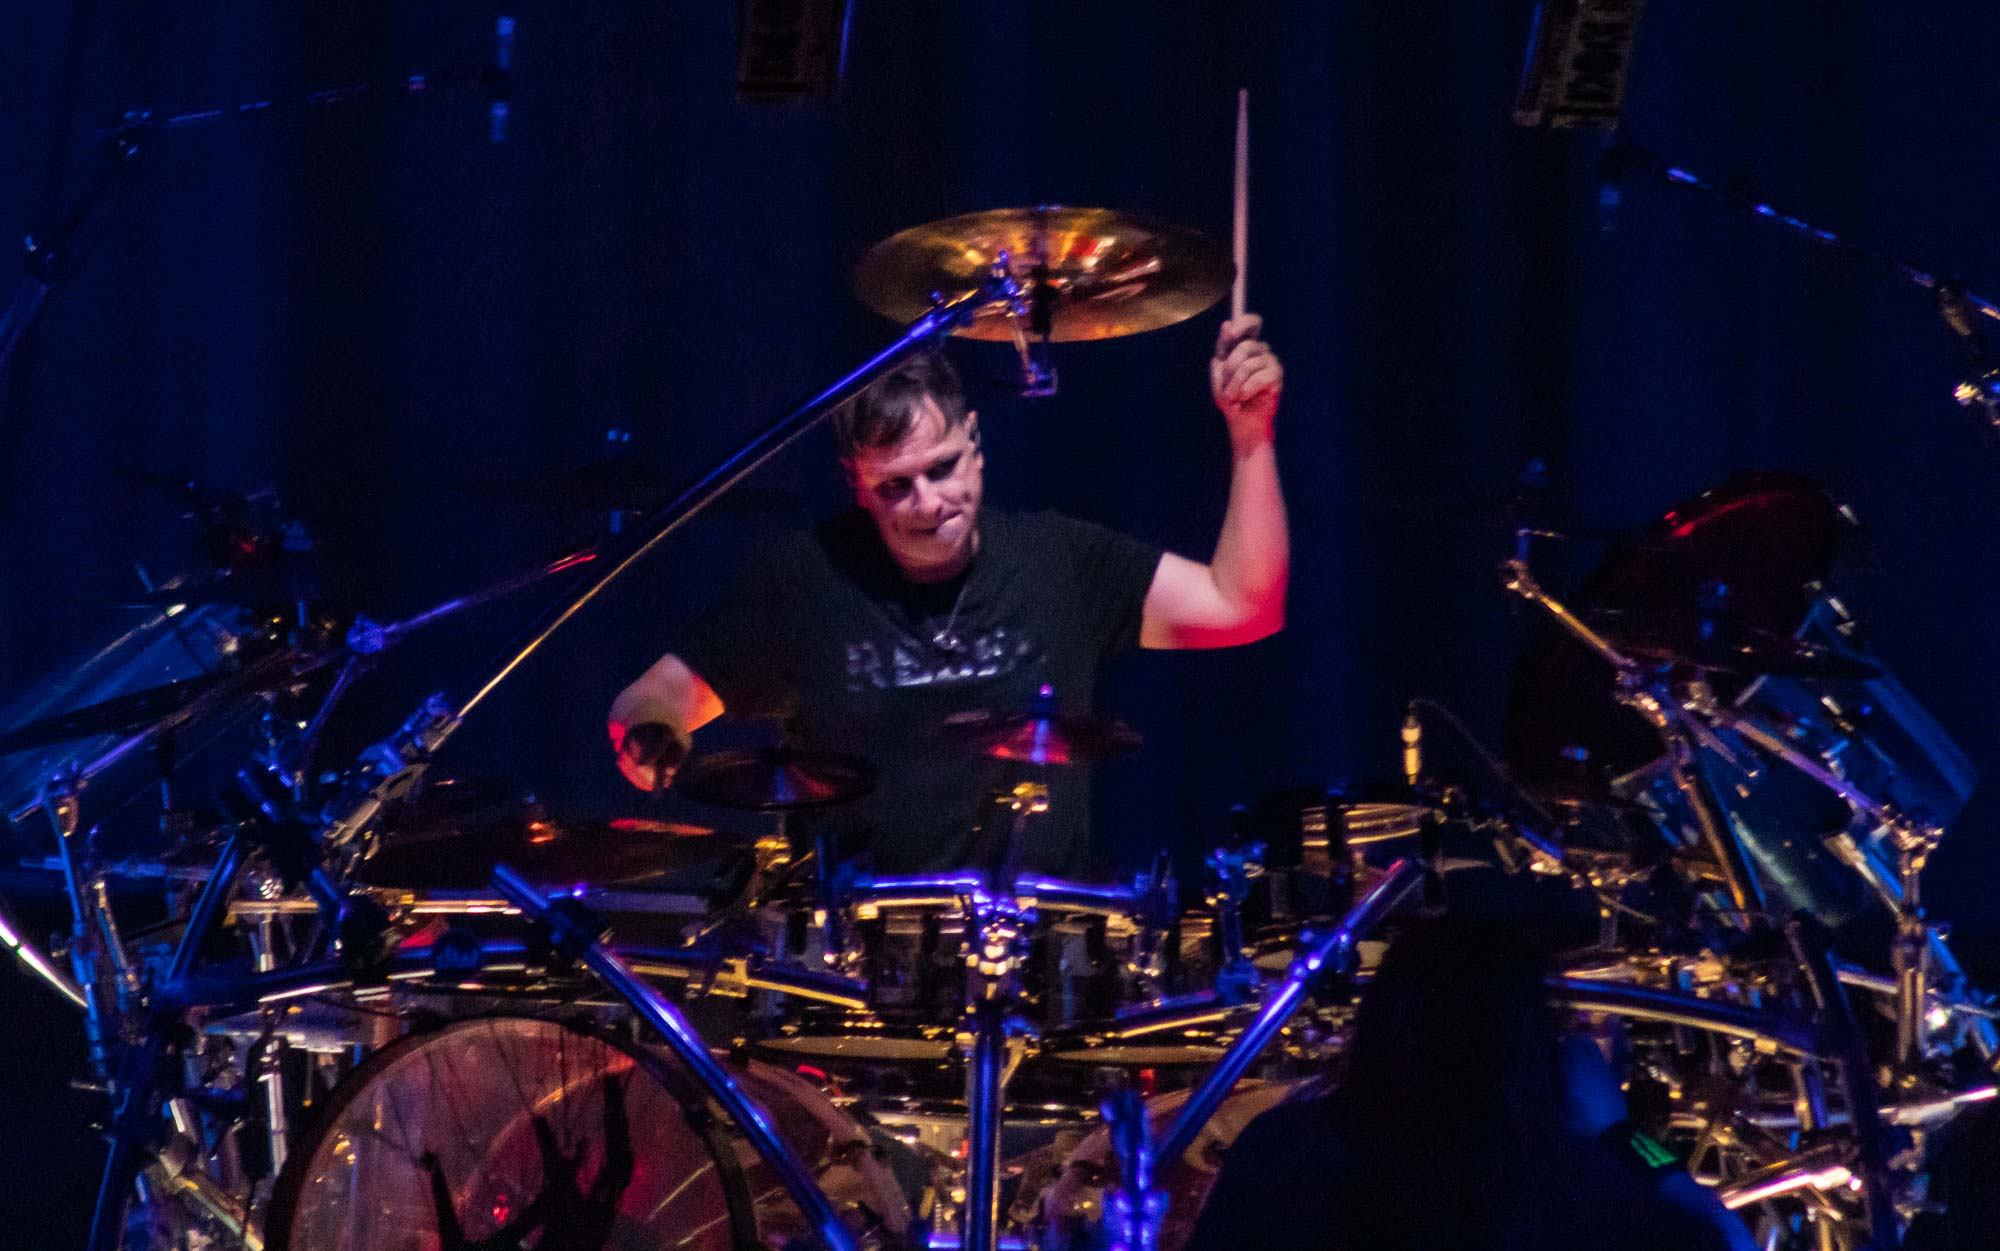 Korn-BudweiserStage-Toronto_Ontario-20190814-JeremyGretzinger16